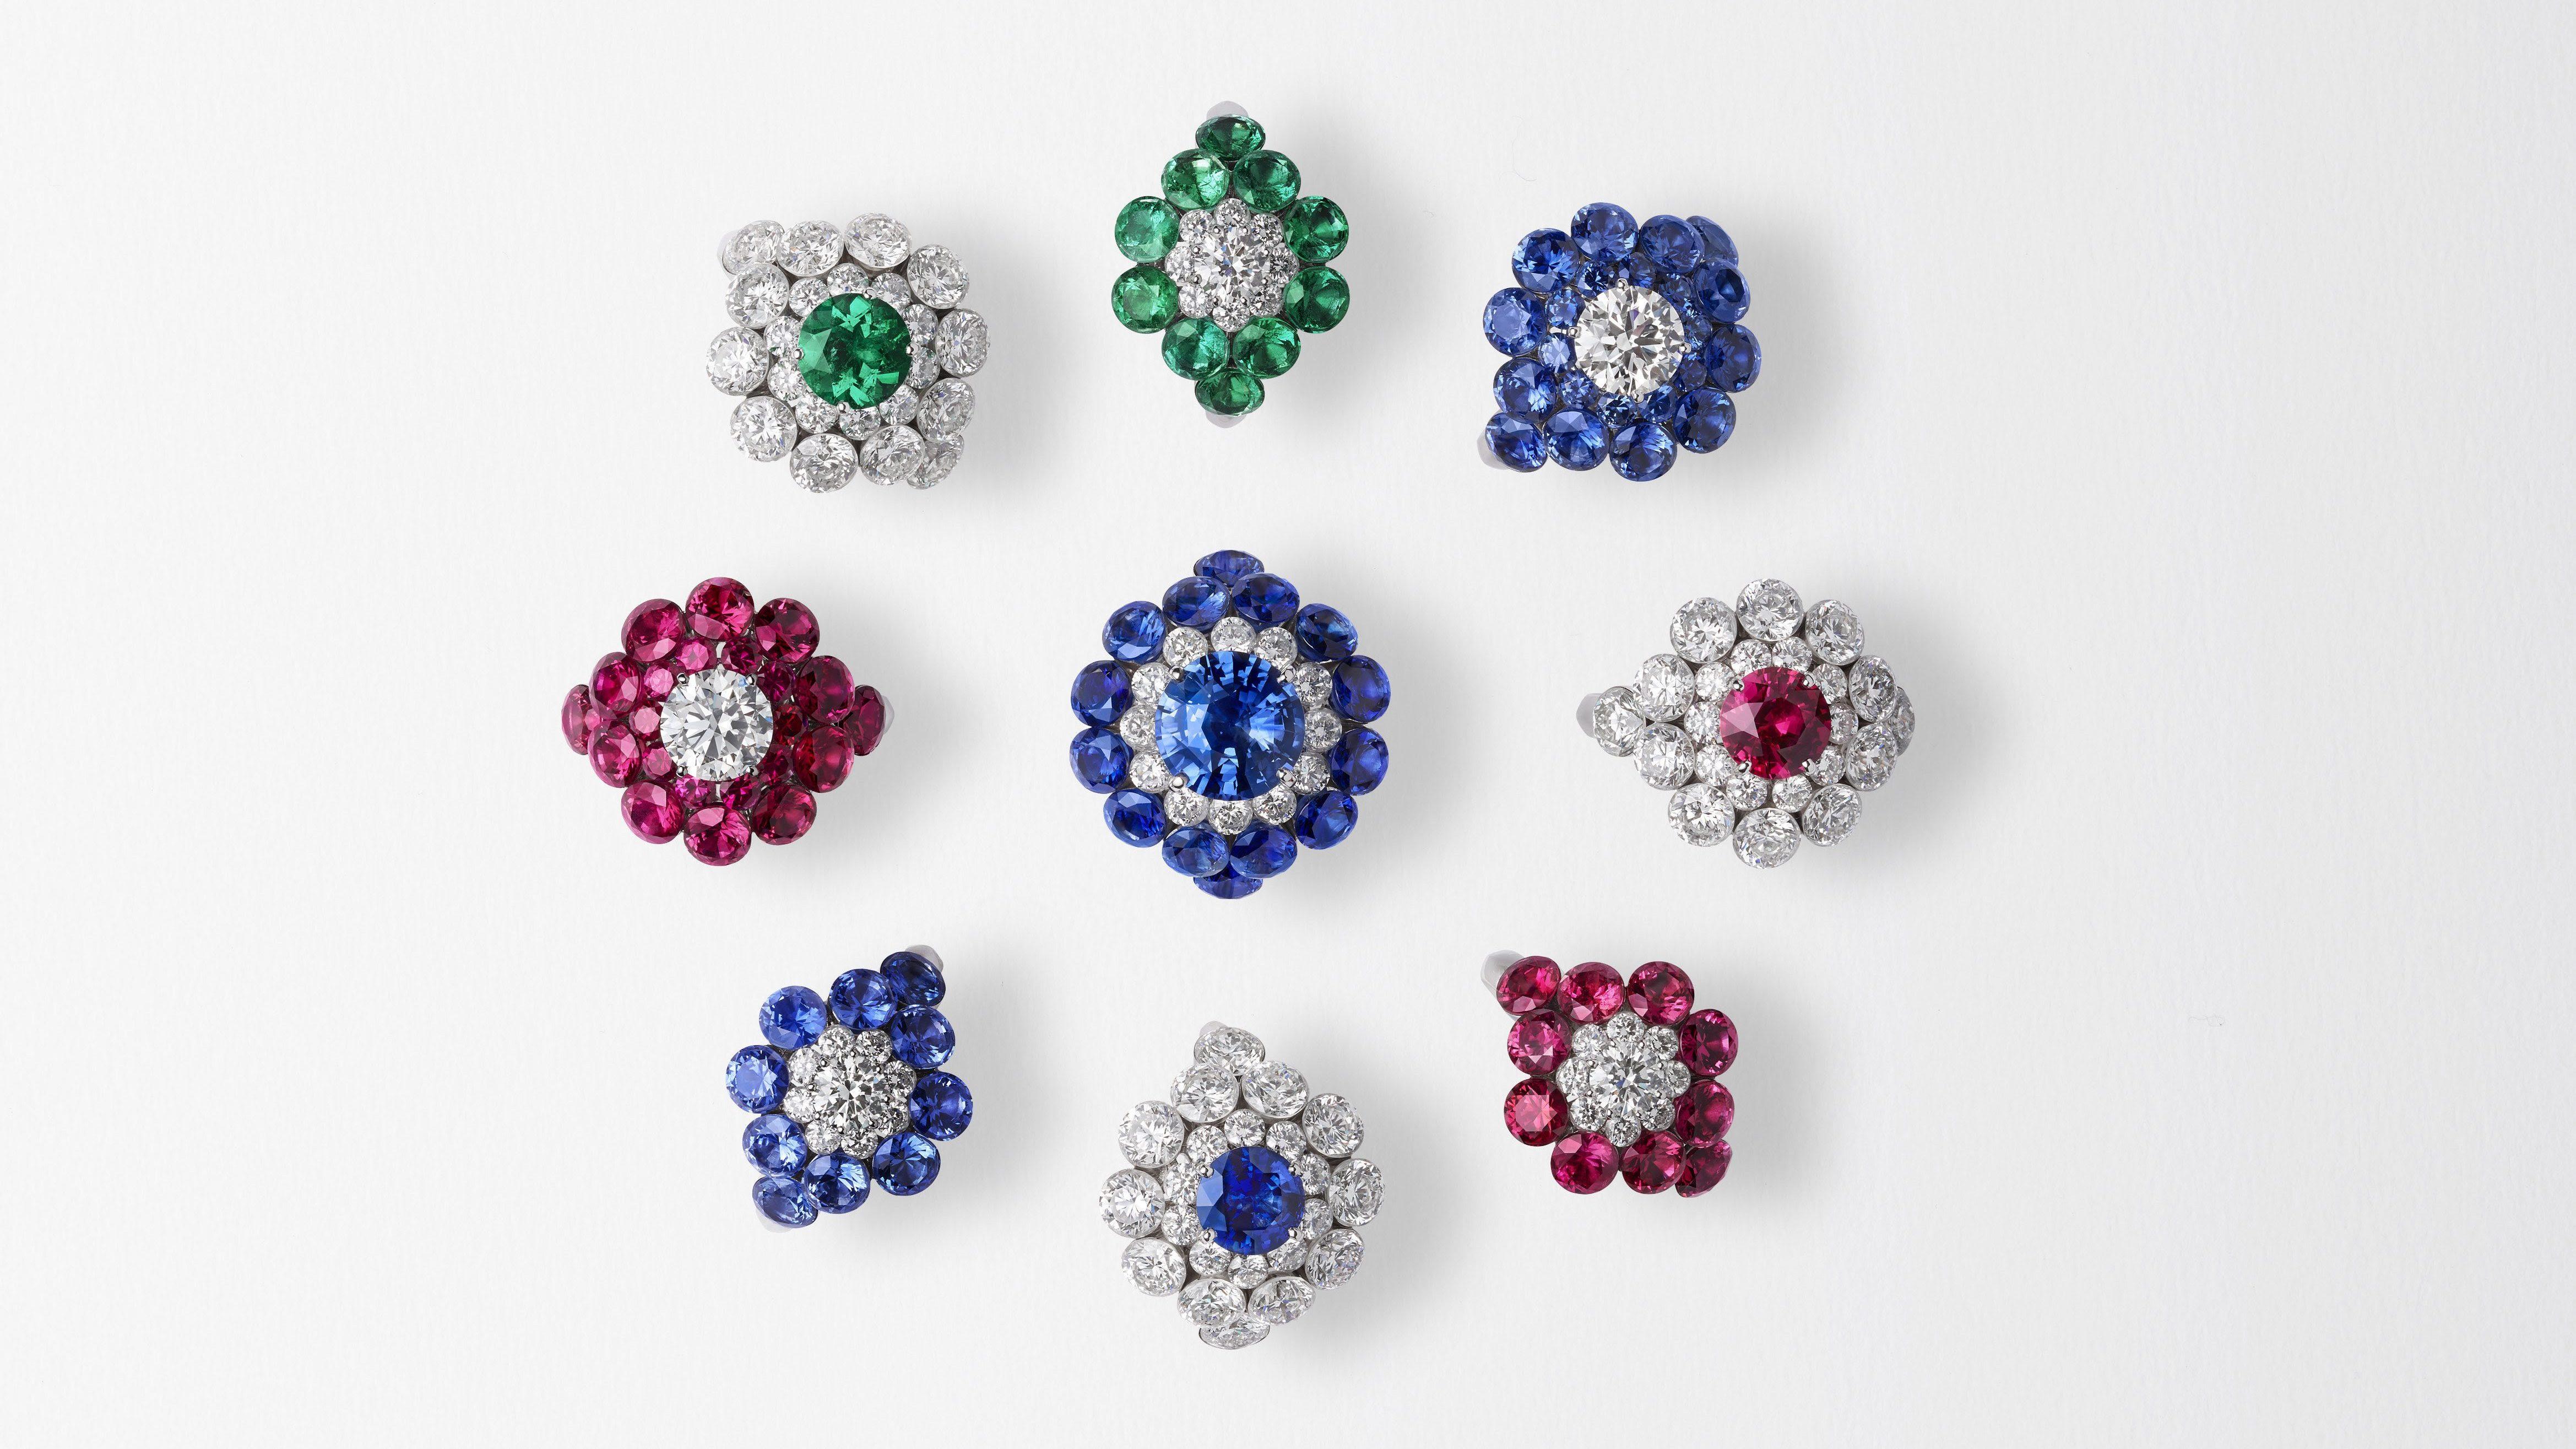 Chopard reinventa el racimo floral con 'Magical Setting'